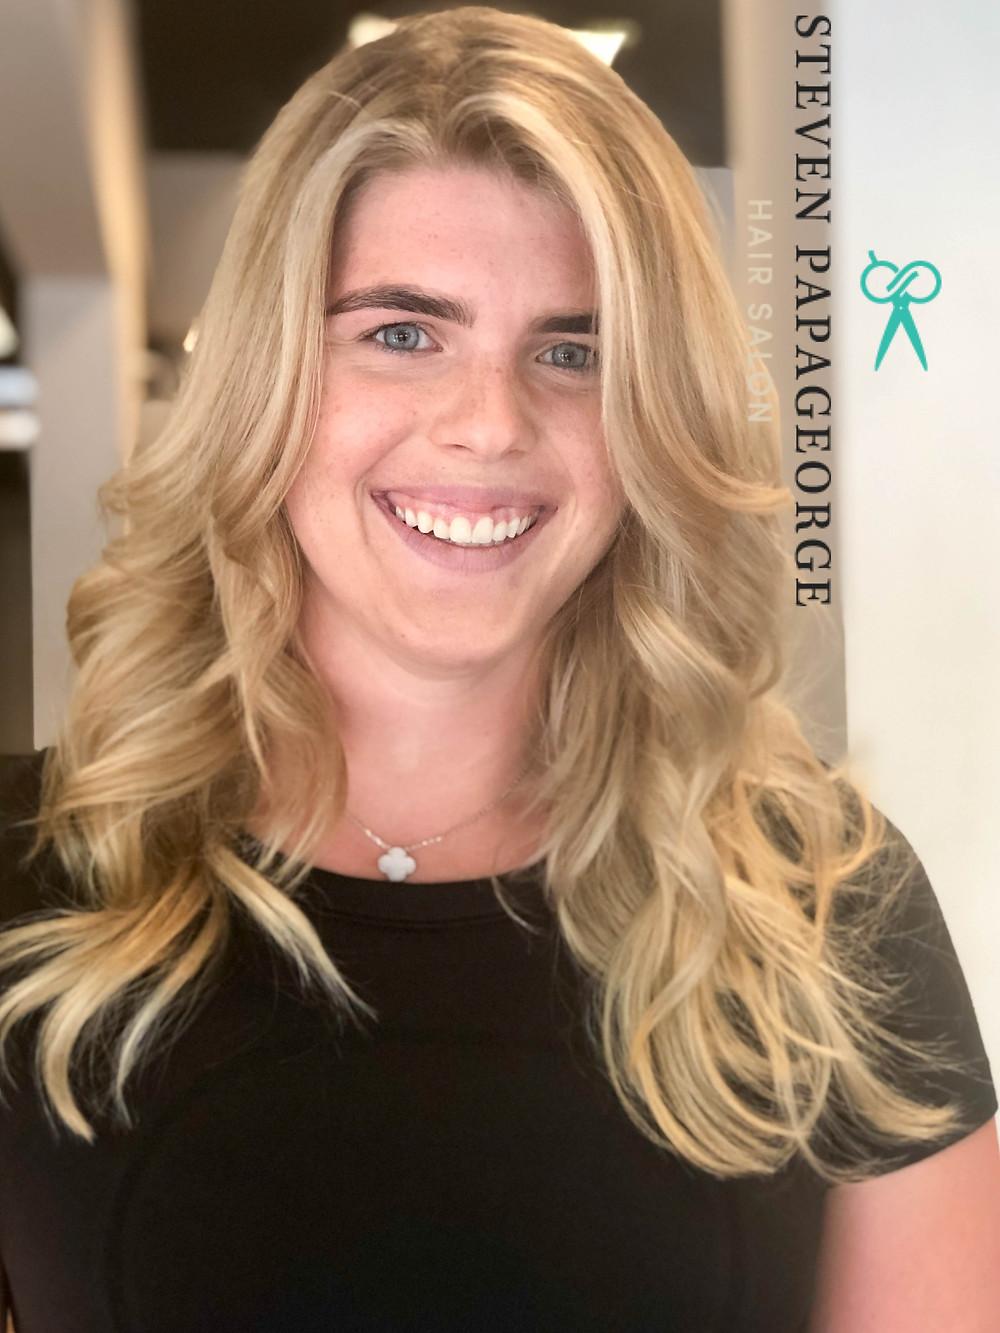 beautiful blonde woman with balayage highlights